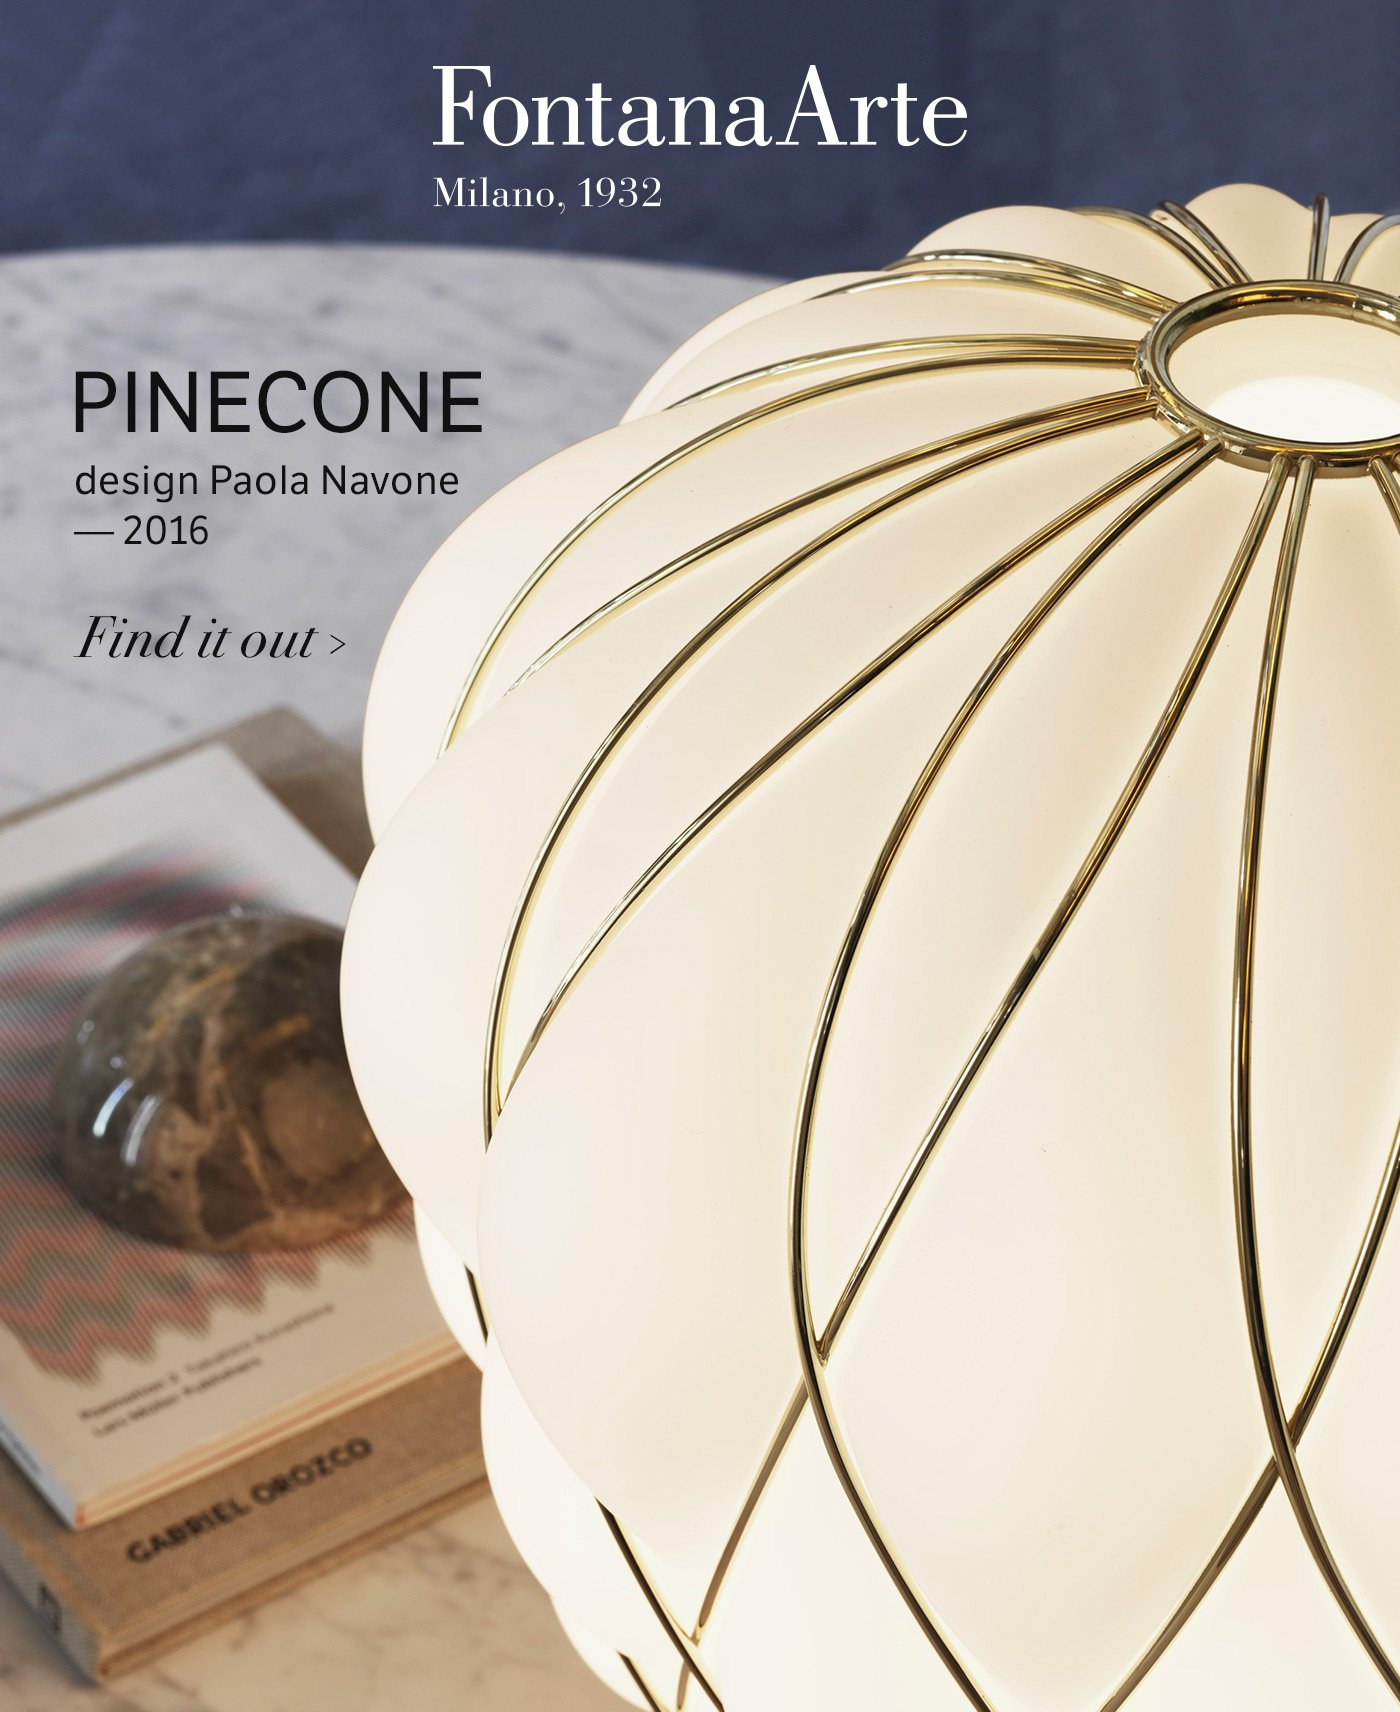 FontanaArte: Pinecone blown glass lamps